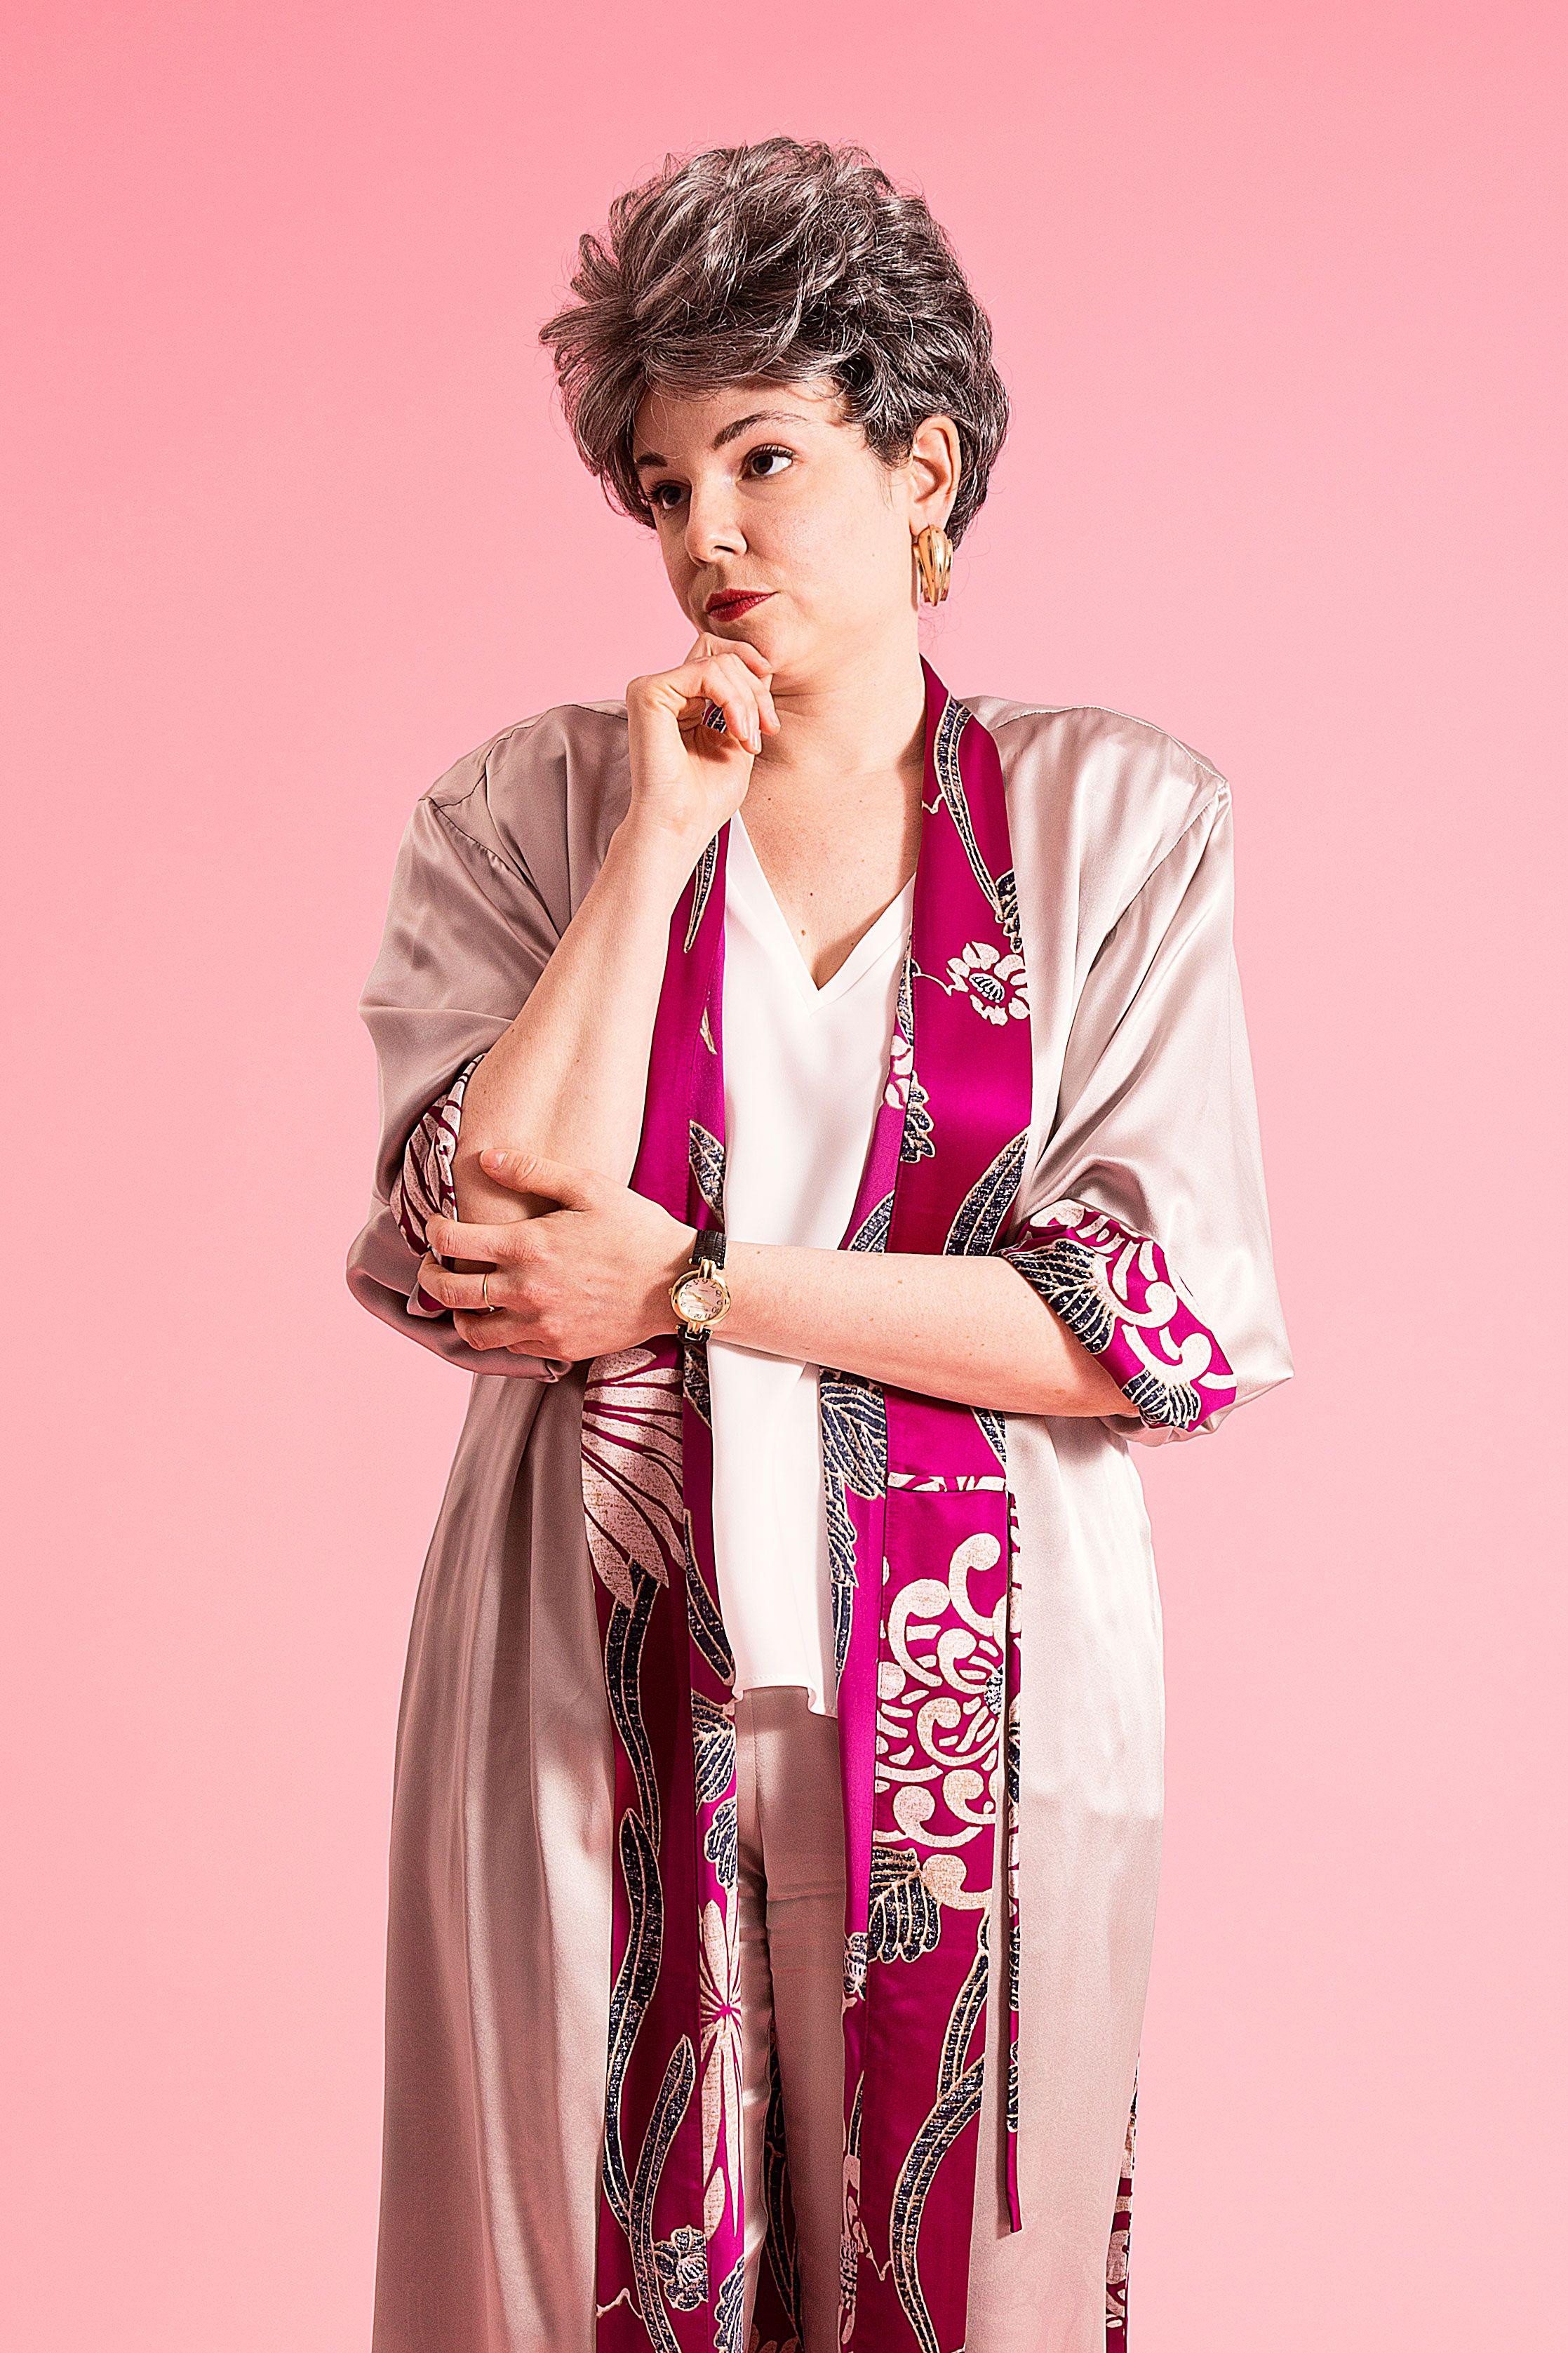 image  sc 1 st  Cosmopolitan & 4 Women Dress Up as Golden Girls